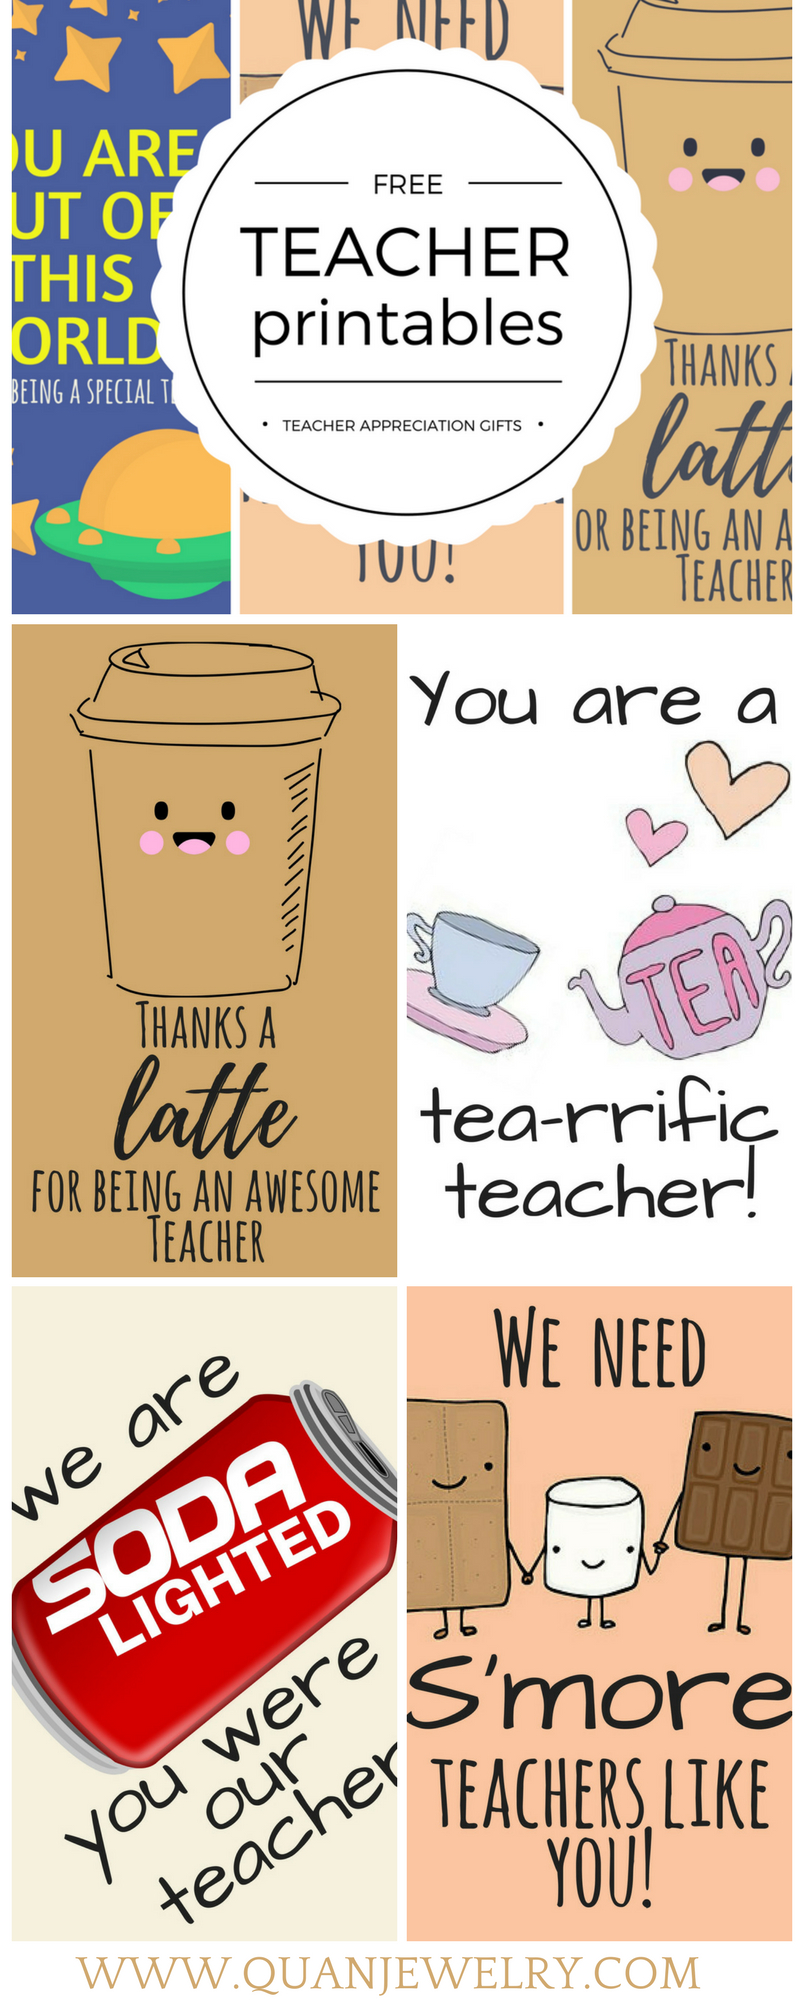 Free Printable Teacher Appreciation Thank You Cards | ✽ Back To - Free Printable Thank You Cards For Teachers